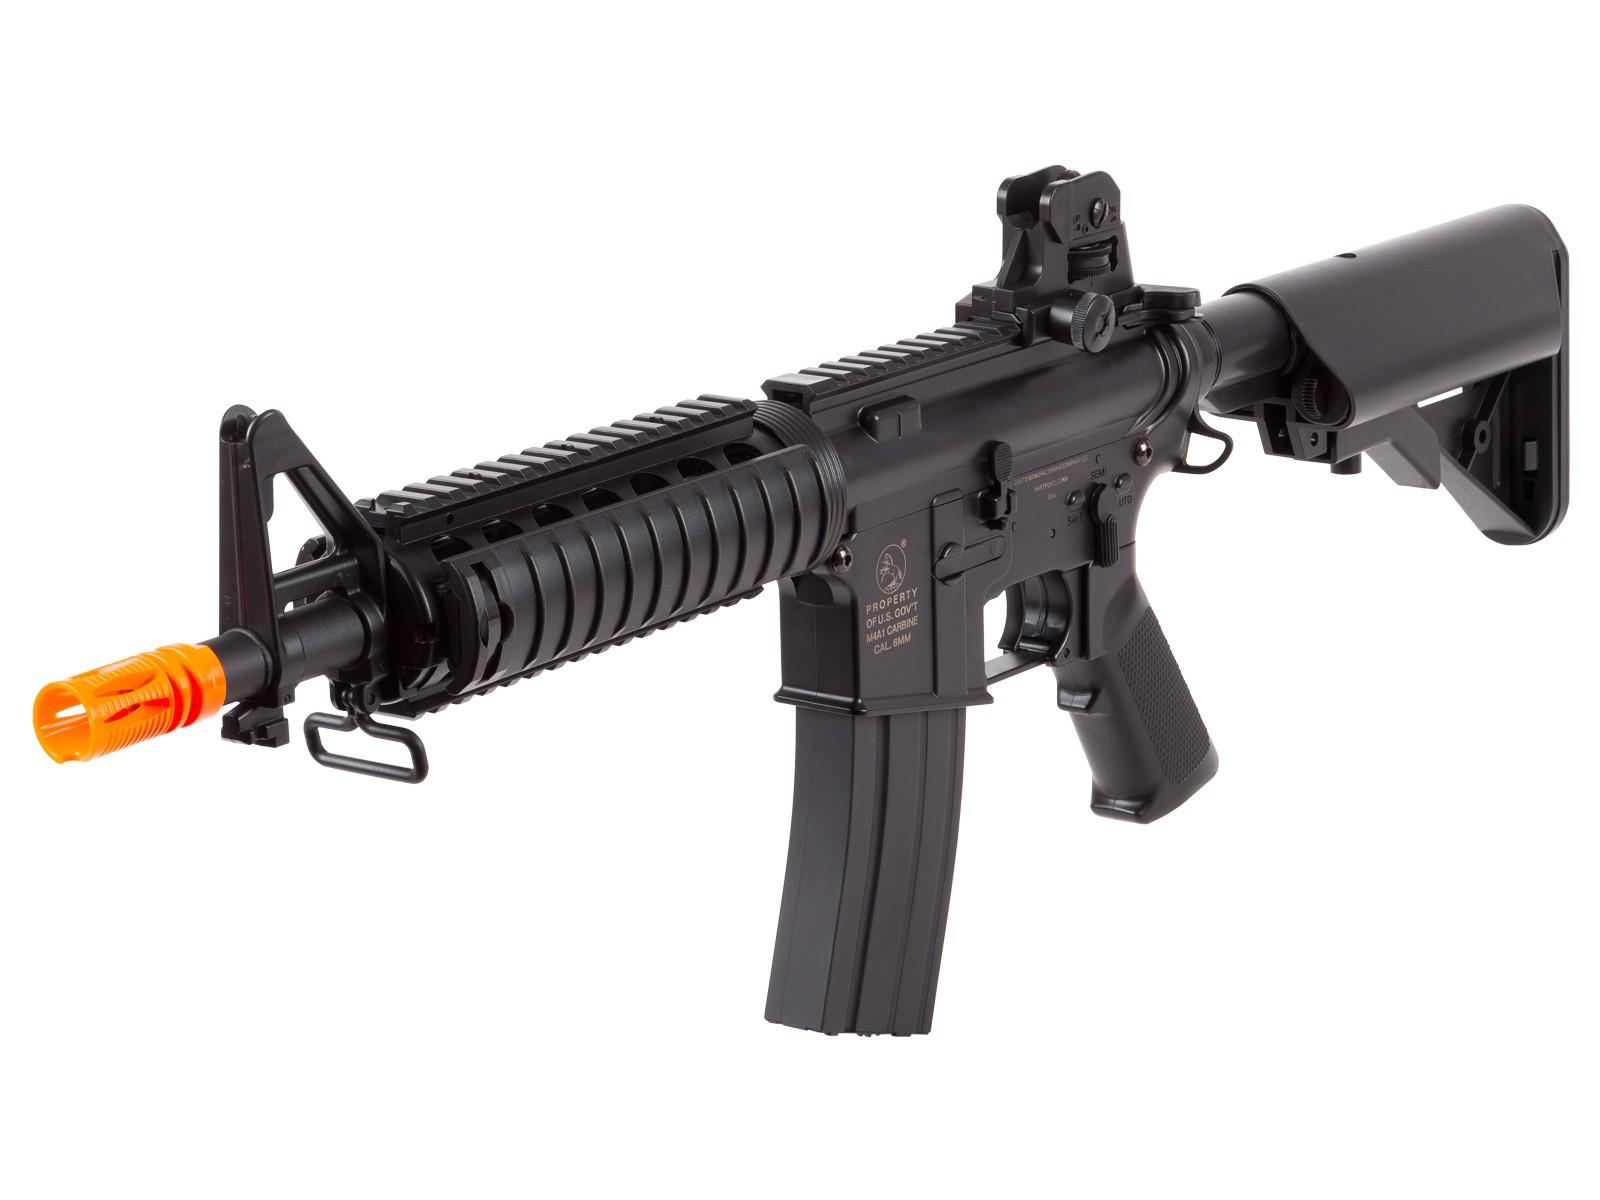 Colt_M4_CQBR_Airsoft_AEG_Black_6mm